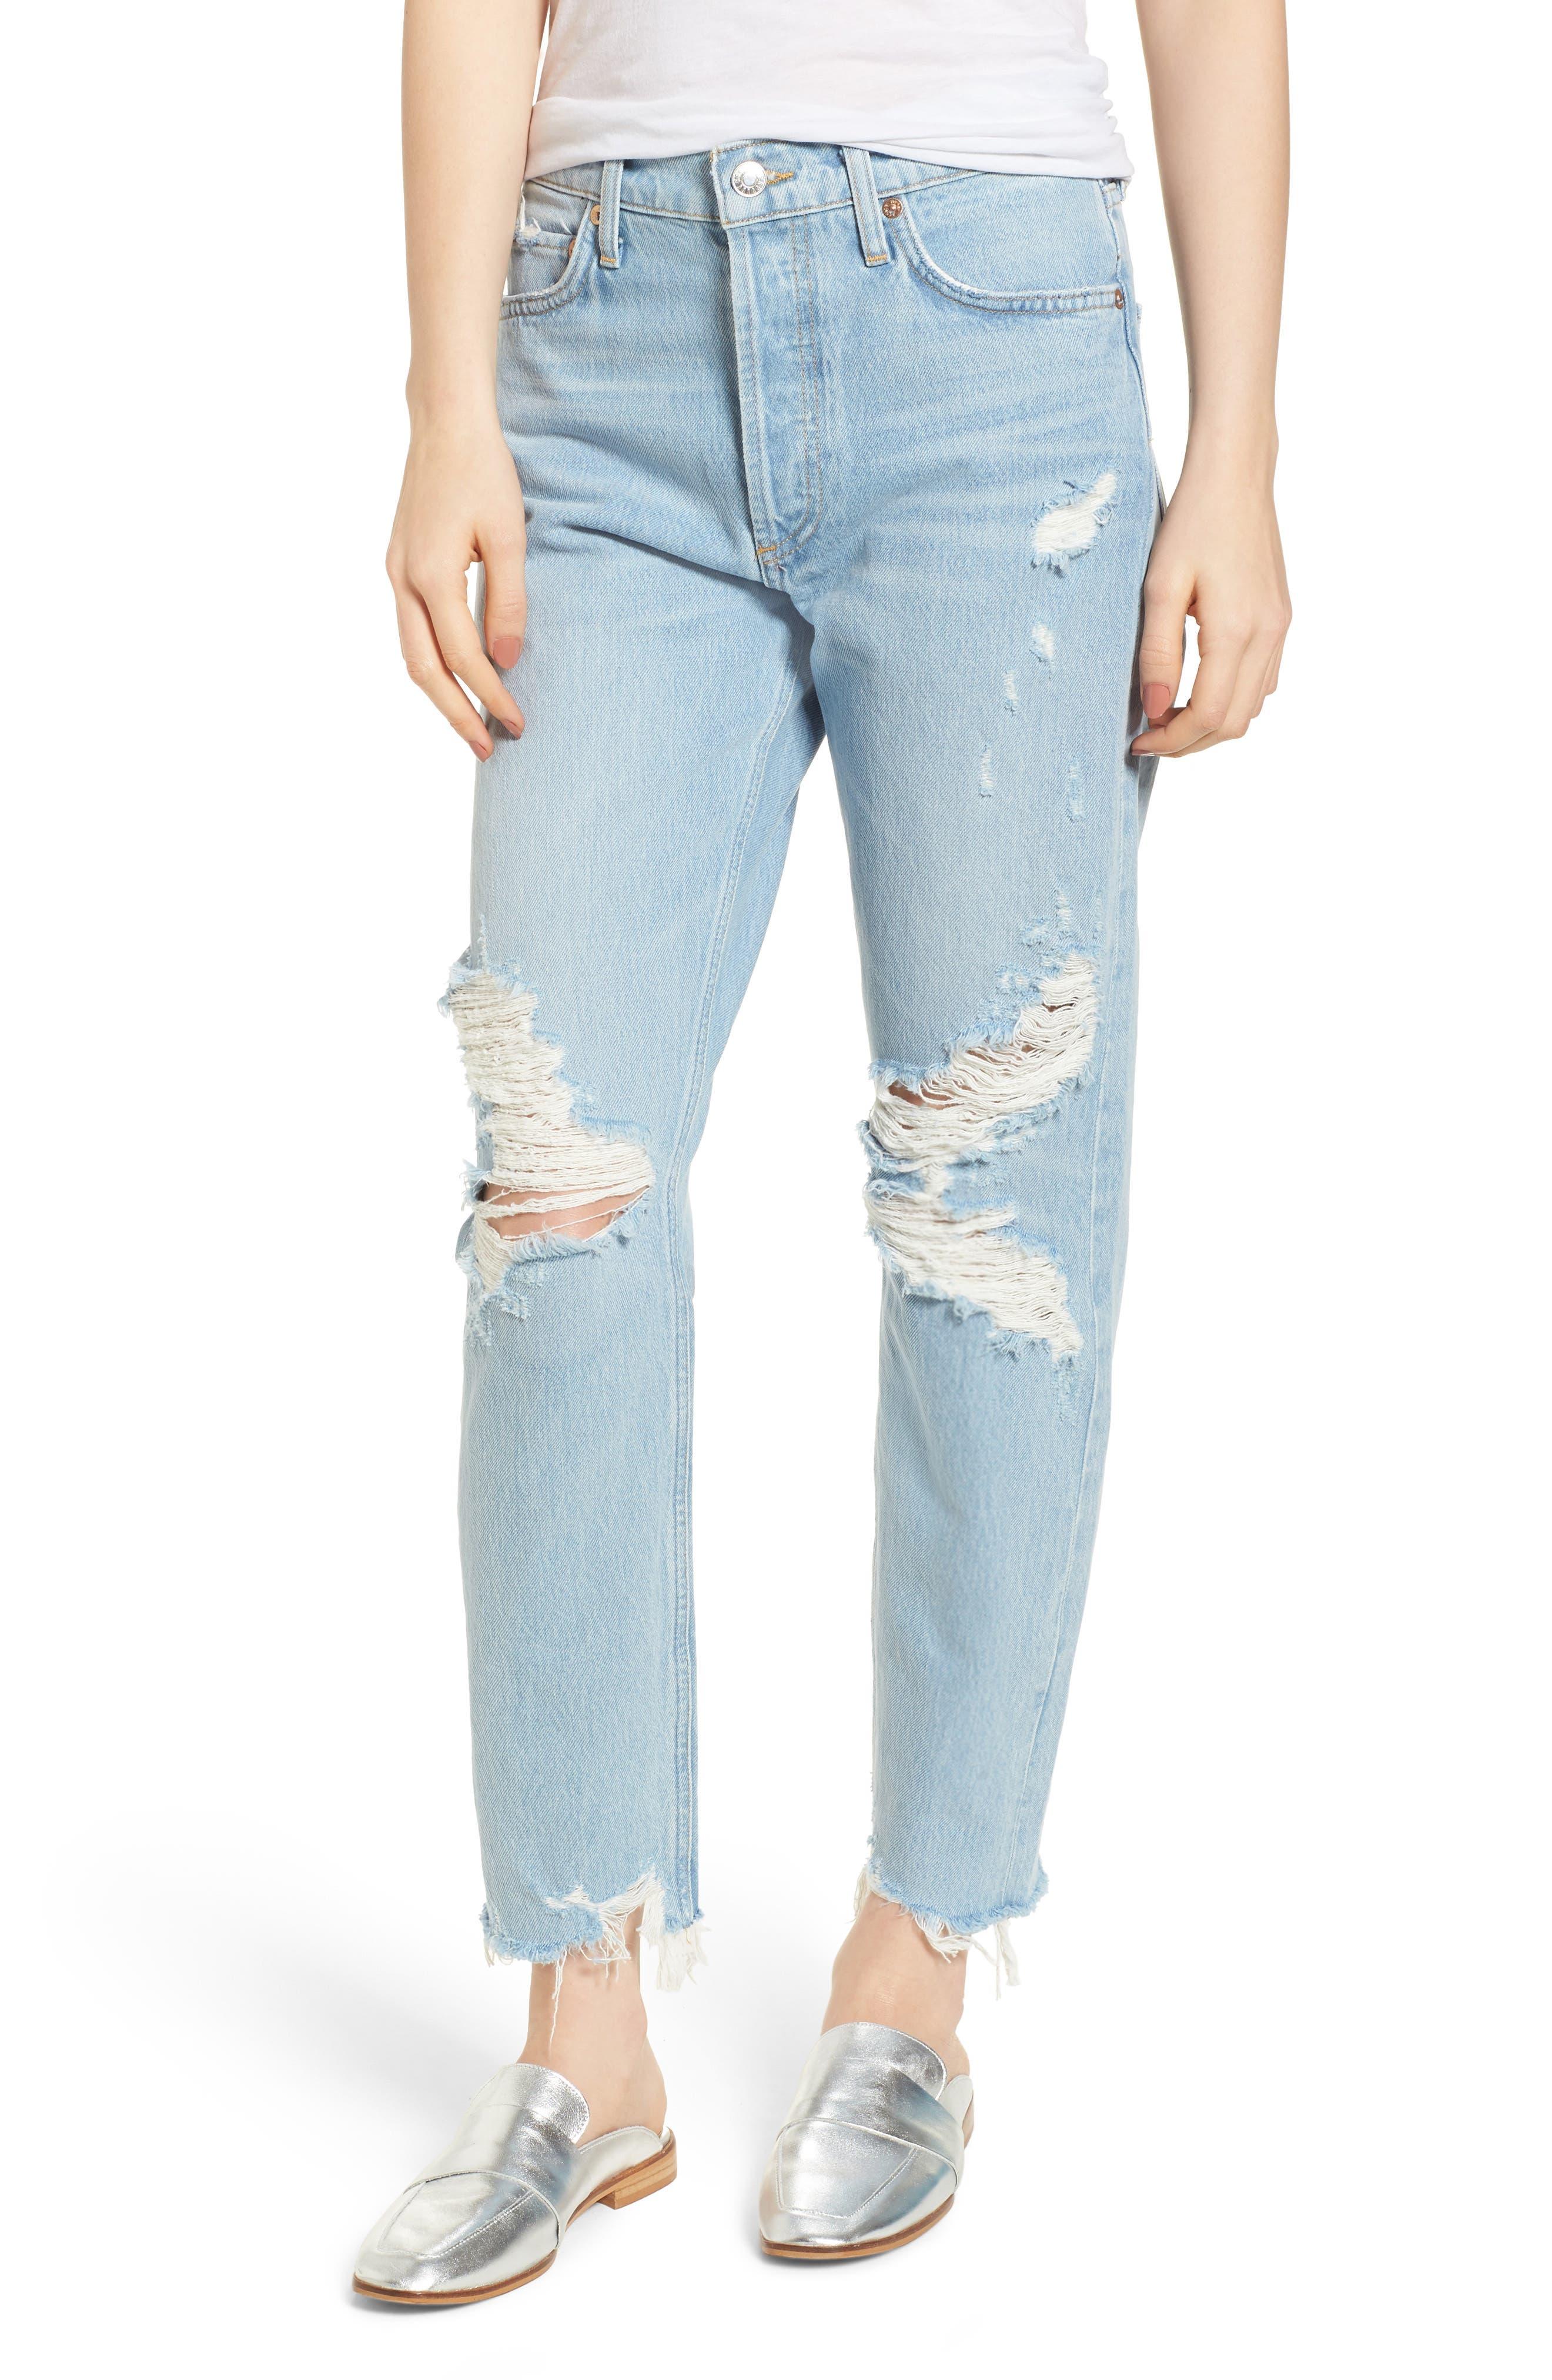 Main Image - AGOLDE Jamie High Waist Ankle Jeans (Temper)